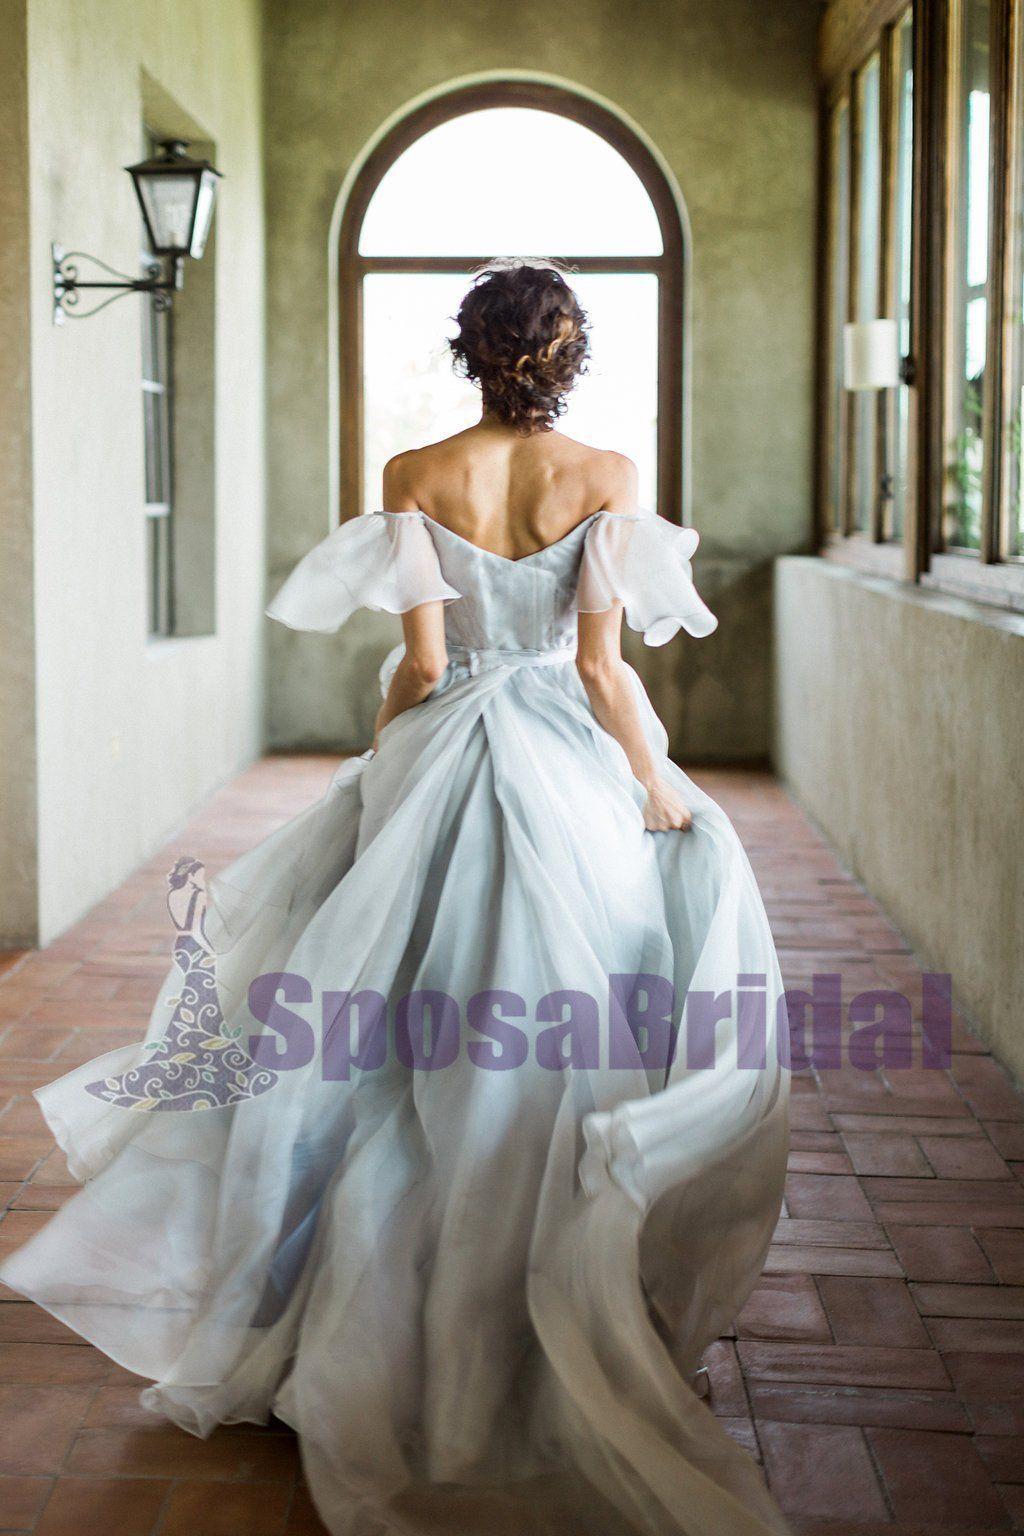 Charming Prom Dresses Off Shoulder Beautiful New Design Popular Prom Dresses Pd0508 Blue Wedding Dresses Prom Dresses Modest Cheap Prom Dresses Long [ 1536 x 1024 Pixel ]